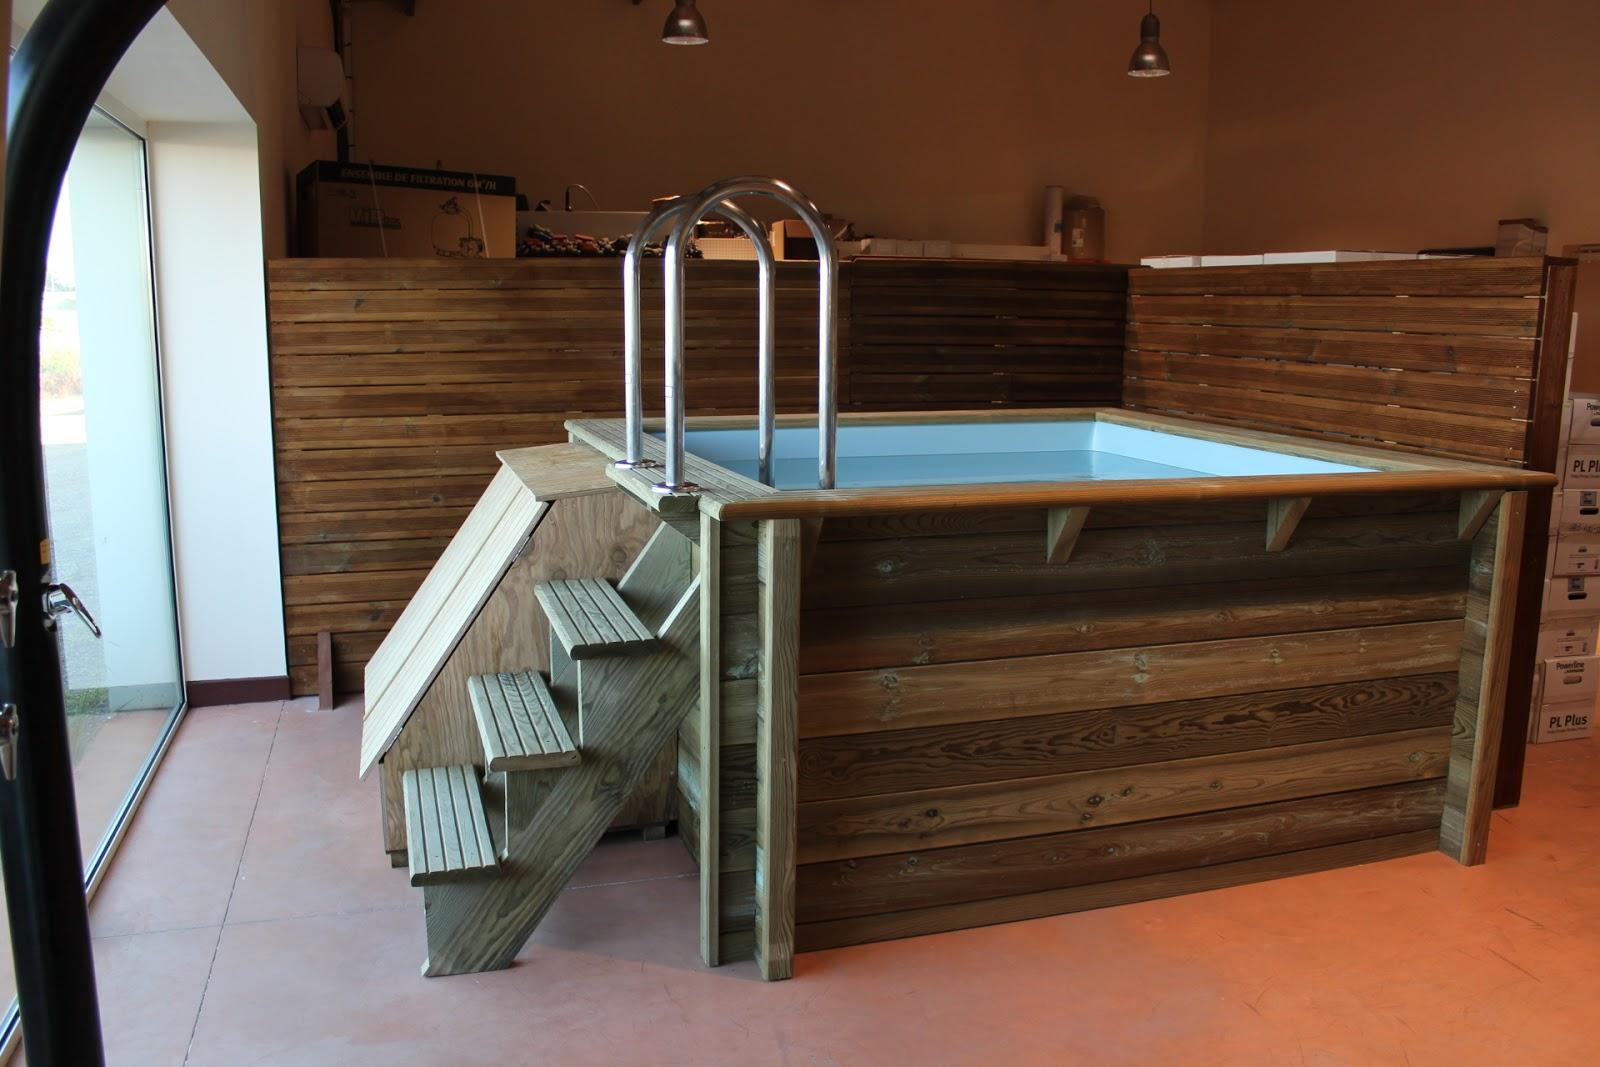 Petite piscine bois for Petite piscine bois carree